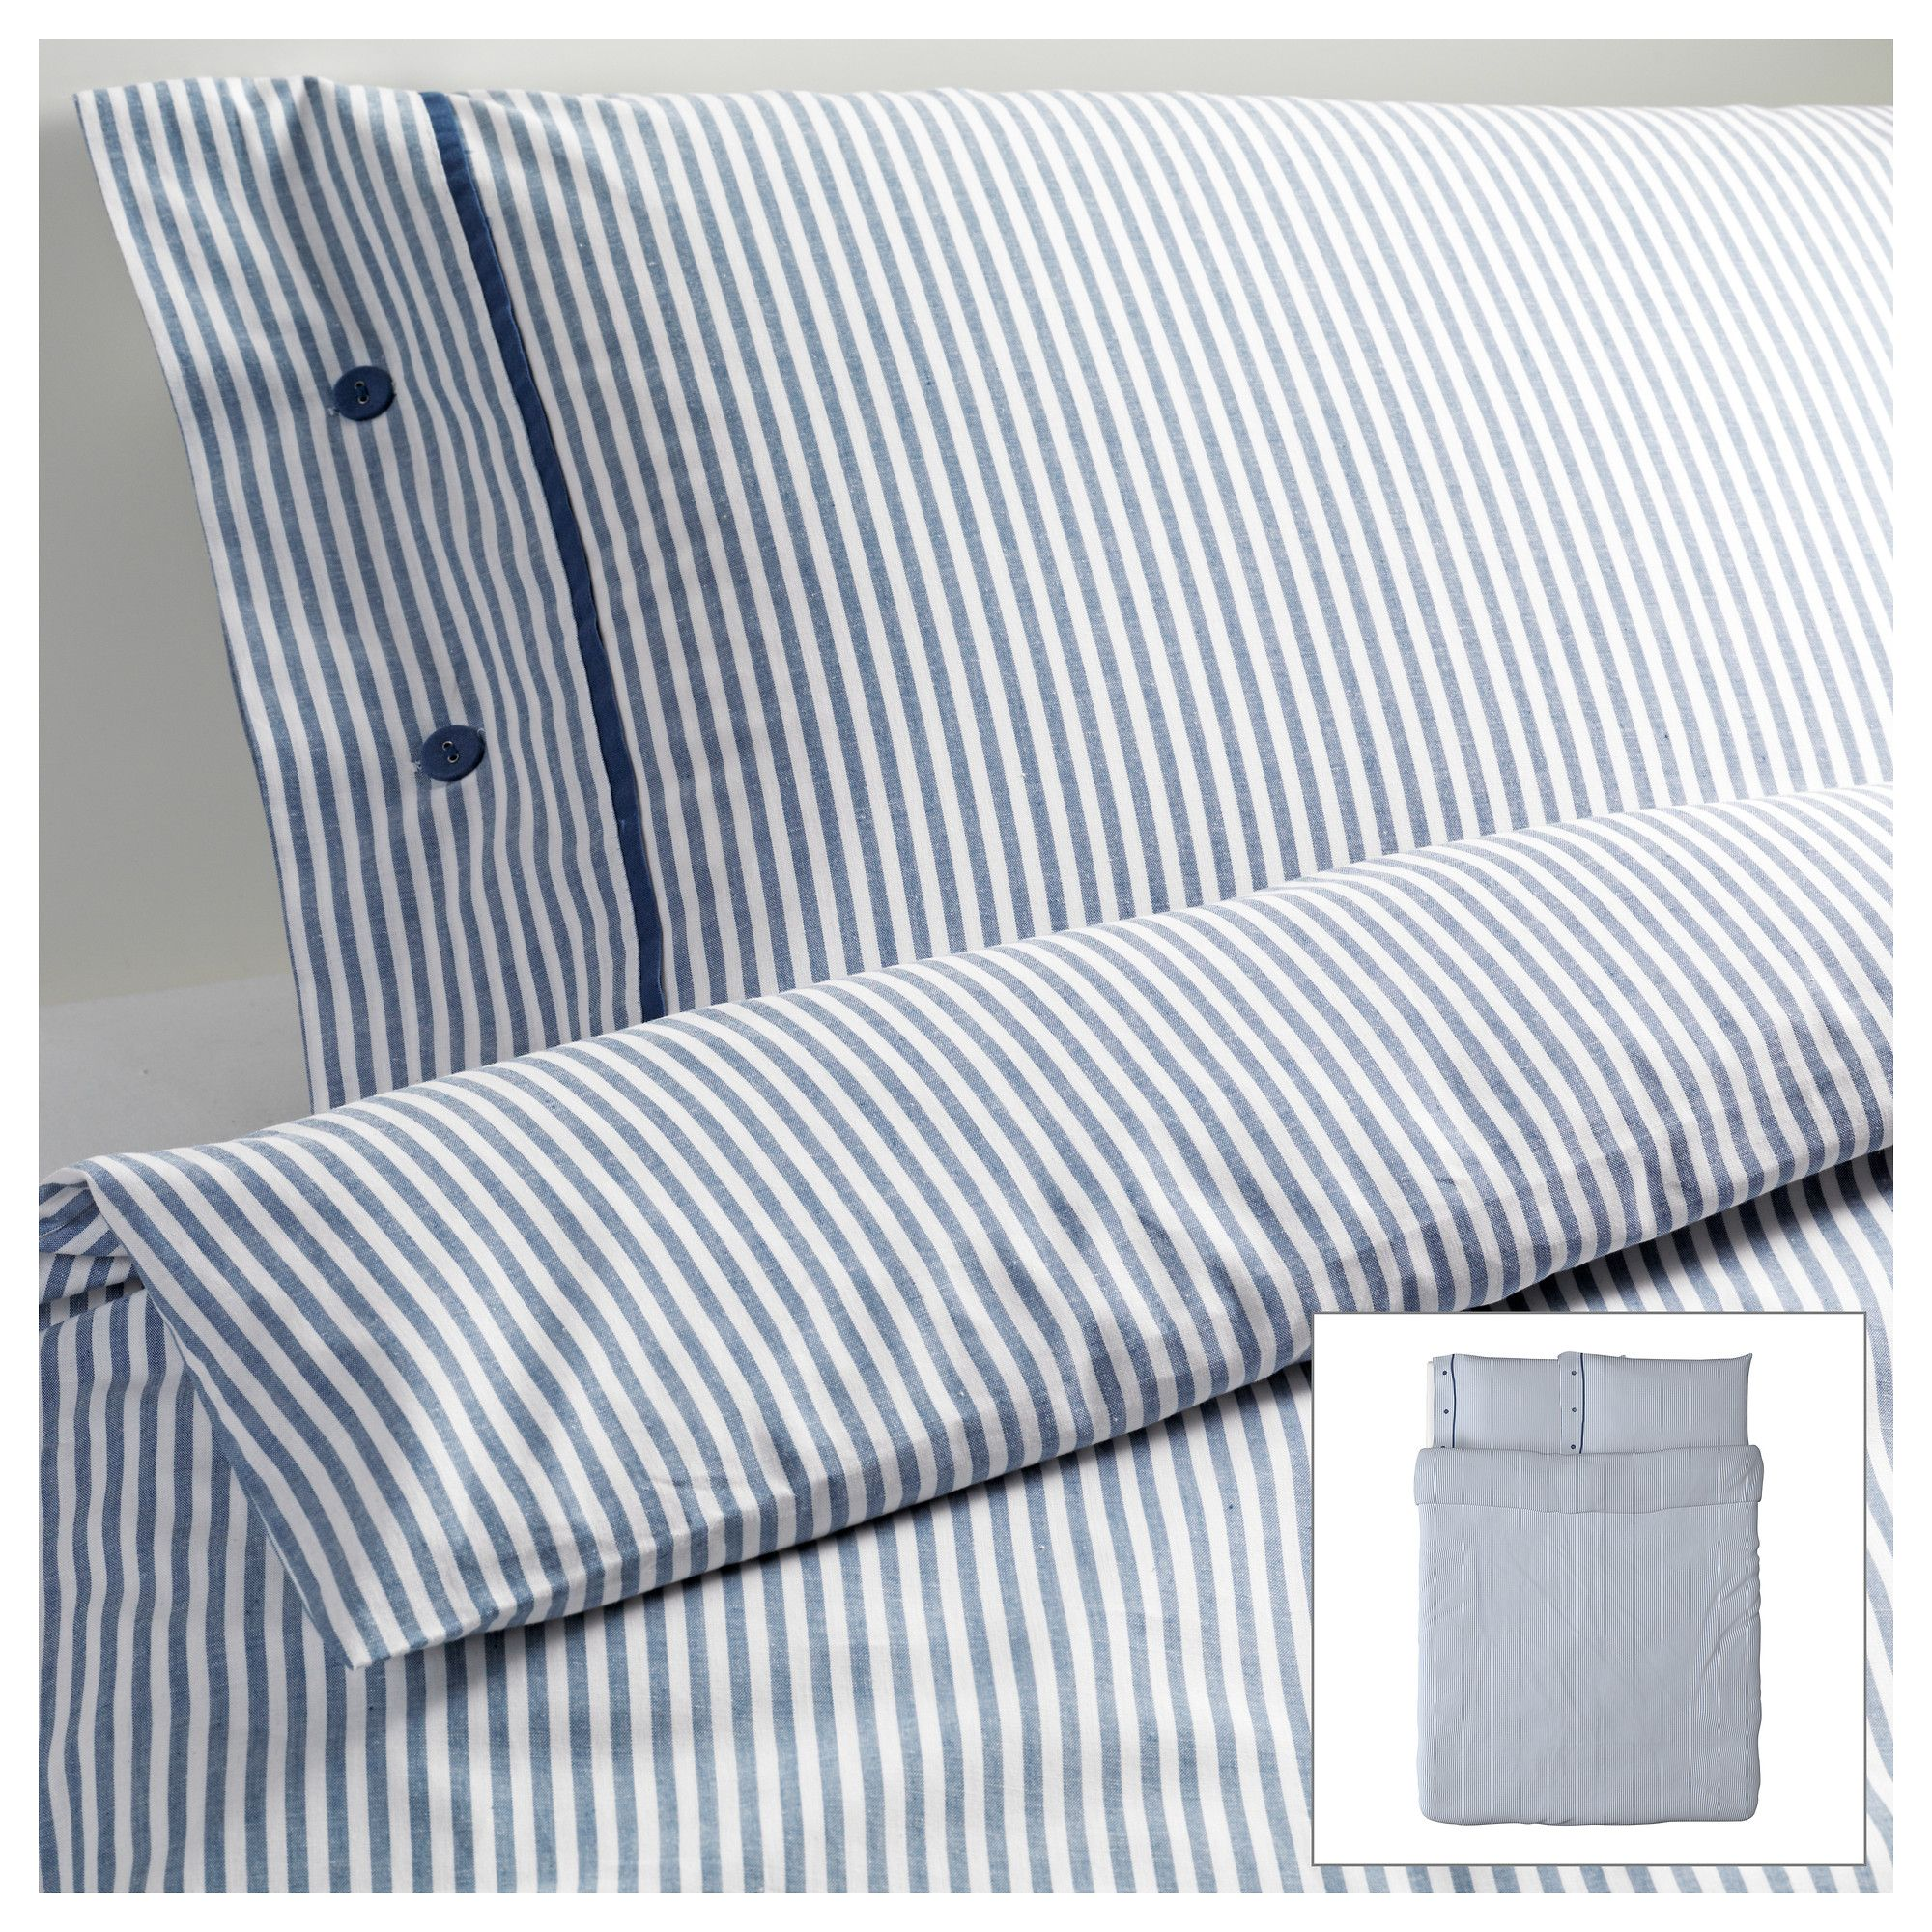 Nyponros Duvet Cover And Pillowcase S White Blue